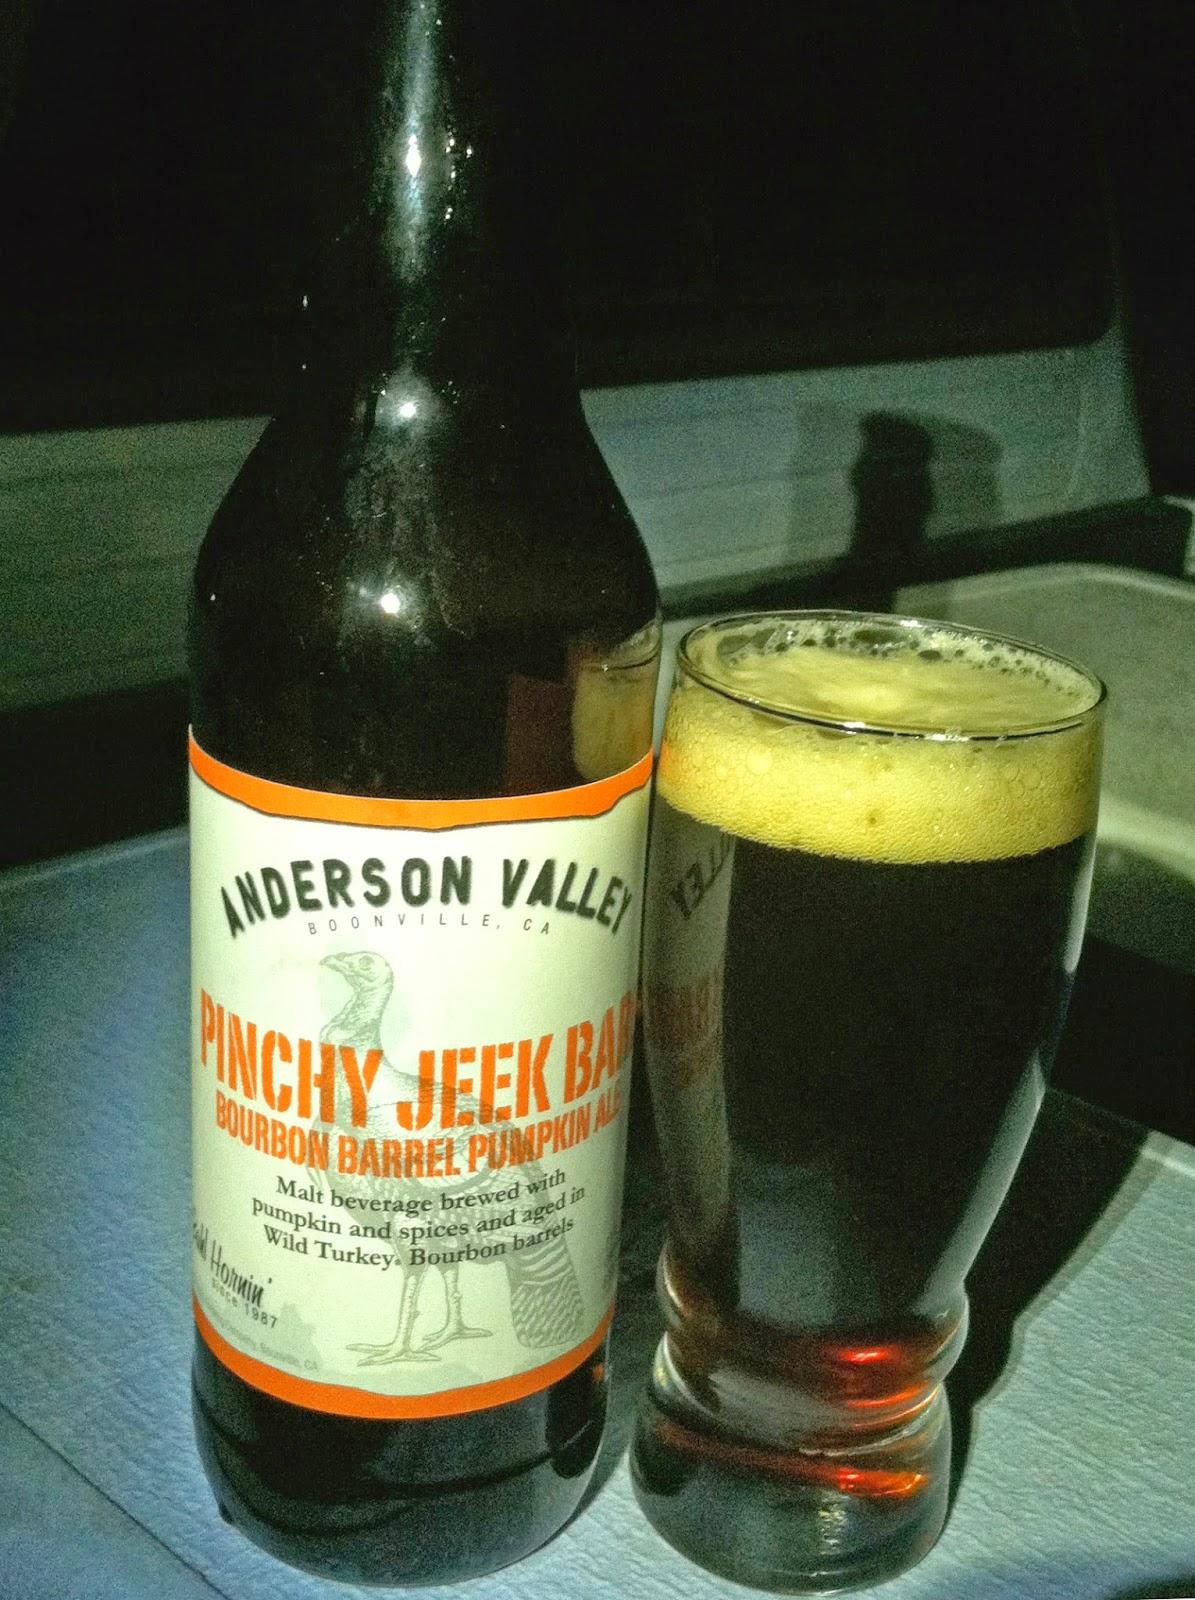 Anderson Valley Pinchy Jeek Barl 1